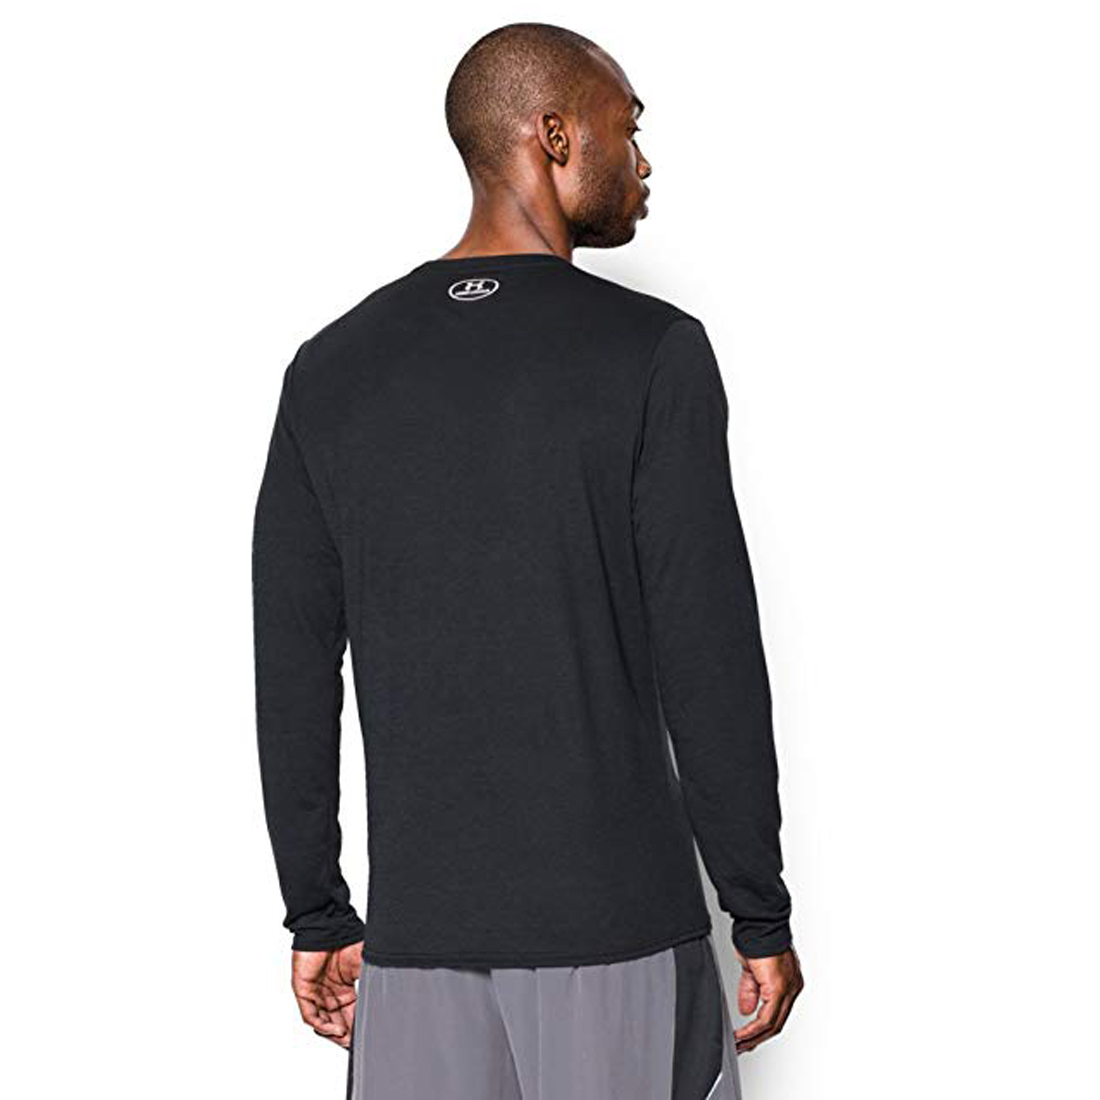 Under Armor Men/'s Short Sleeve Shirt